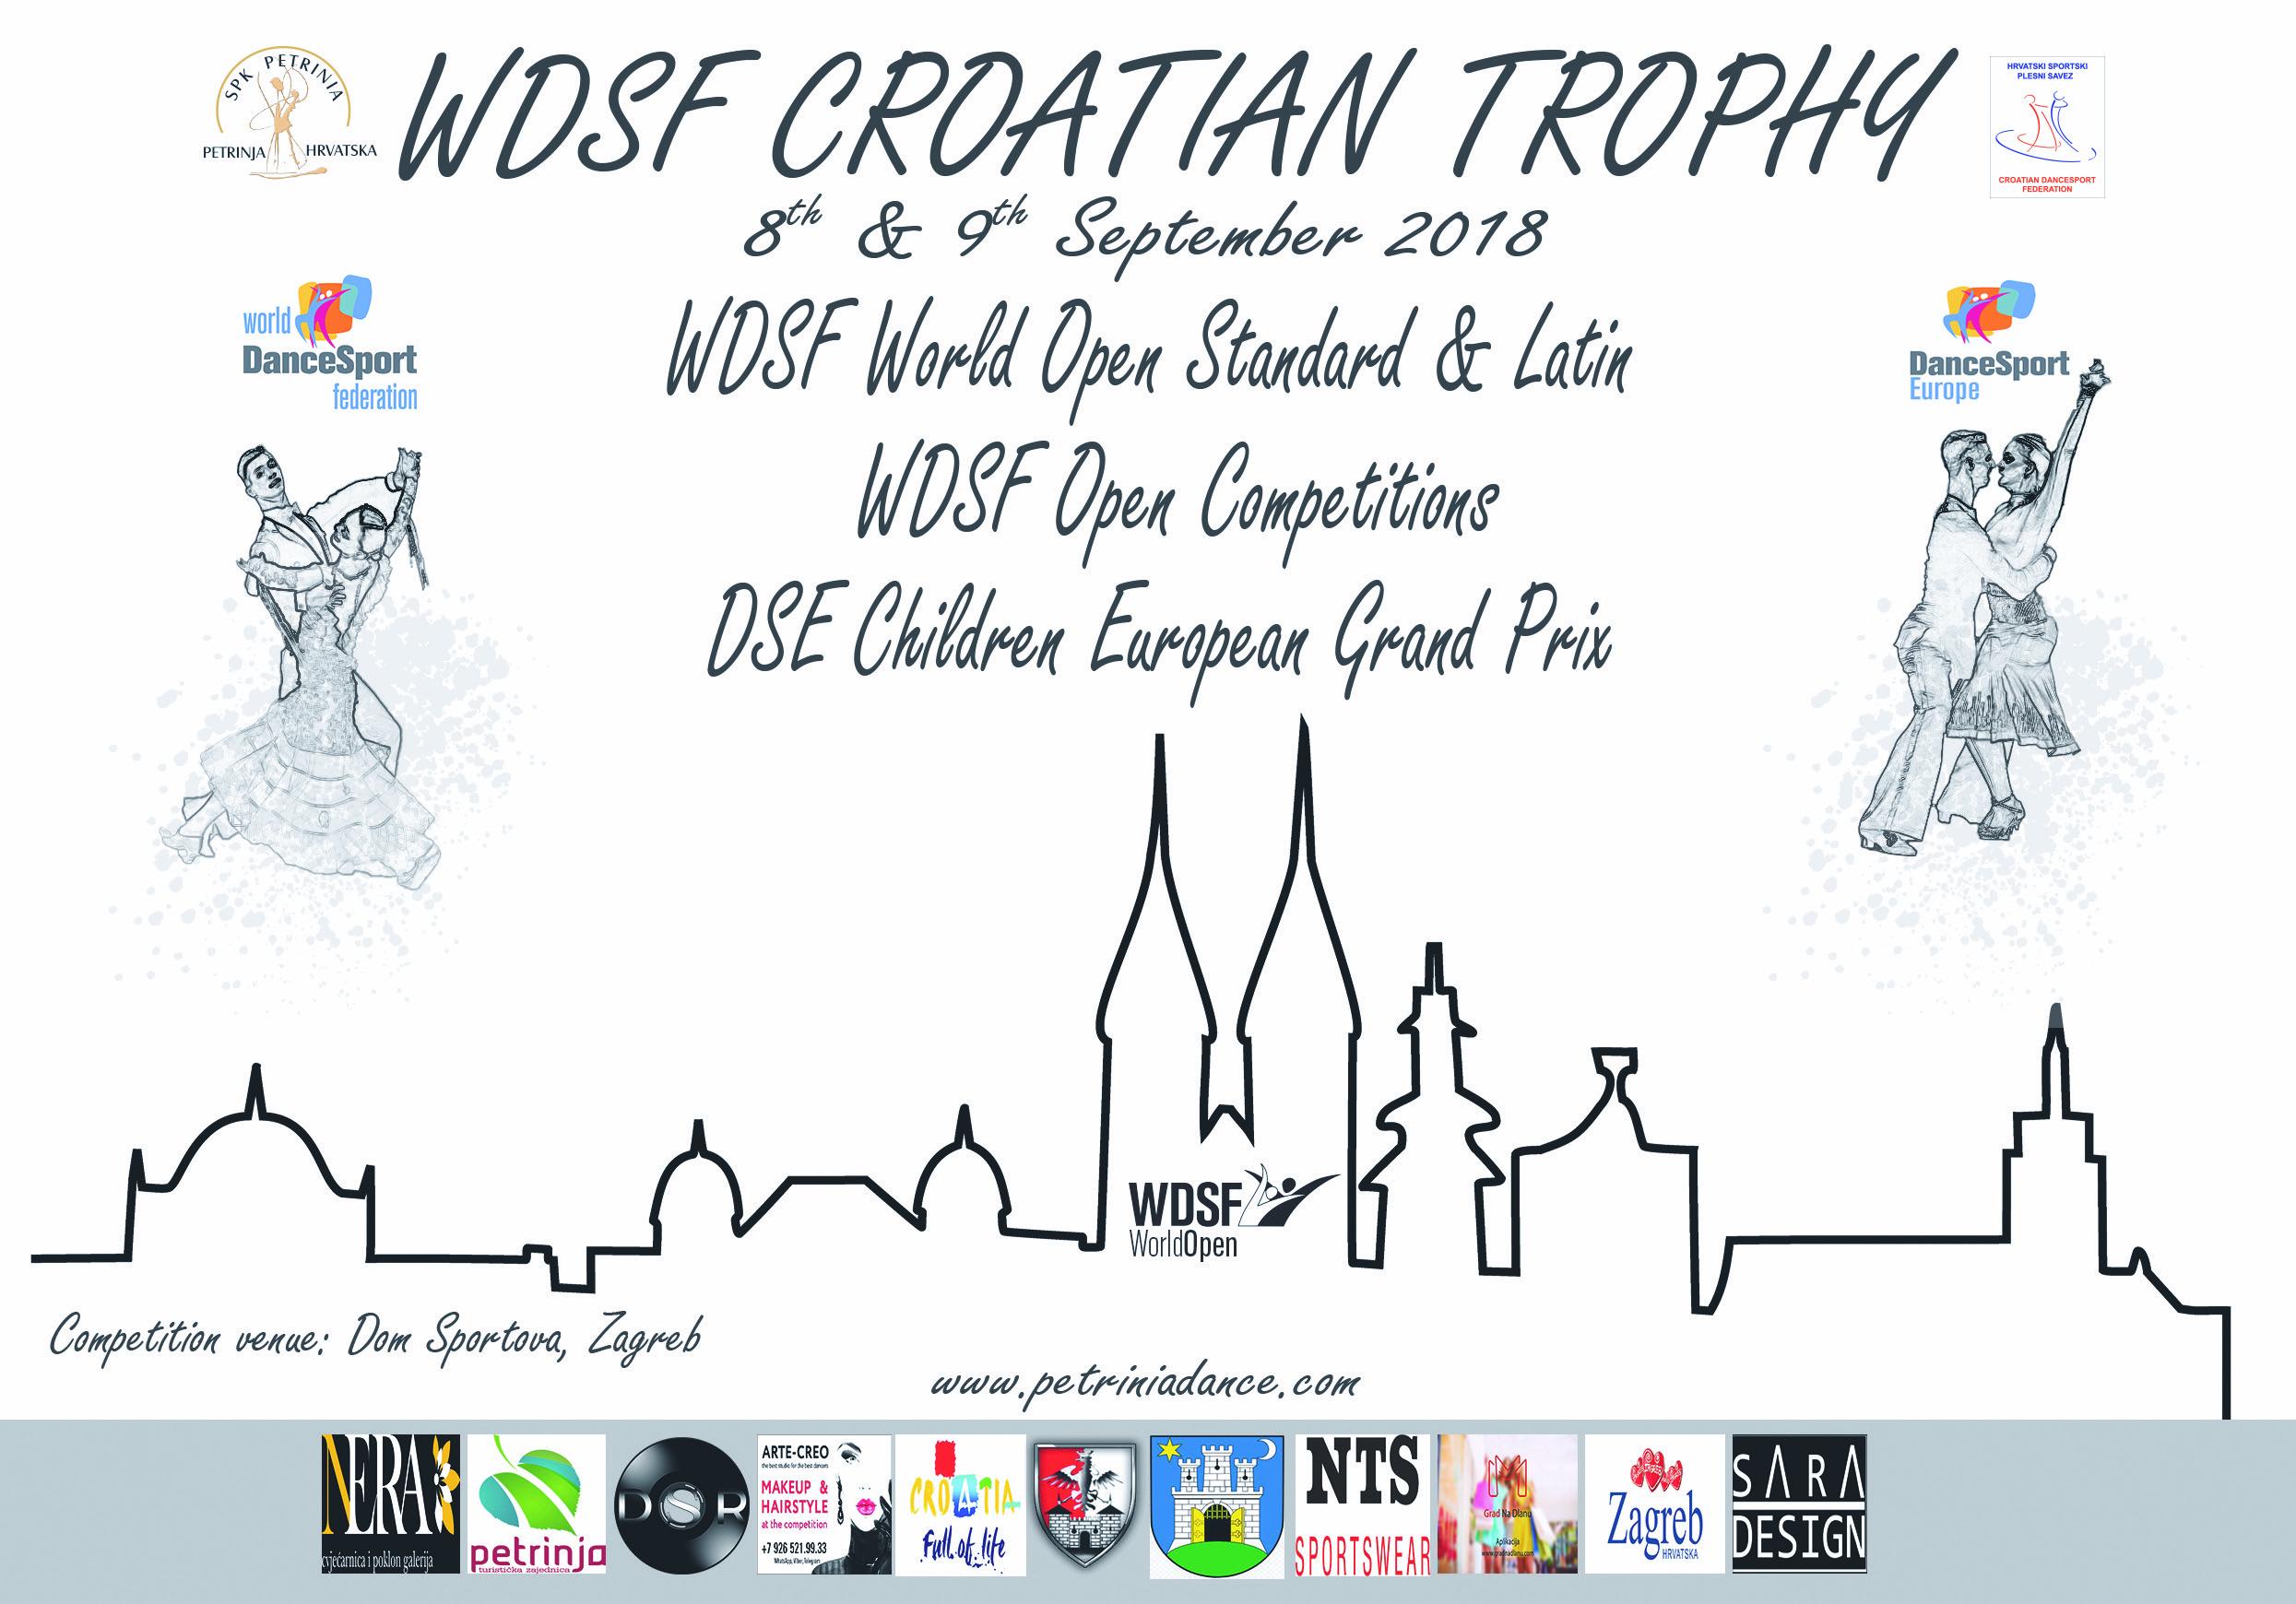 WDSF Croatian Trophy 2018 – međunarodno natjecanje u Zagrebu